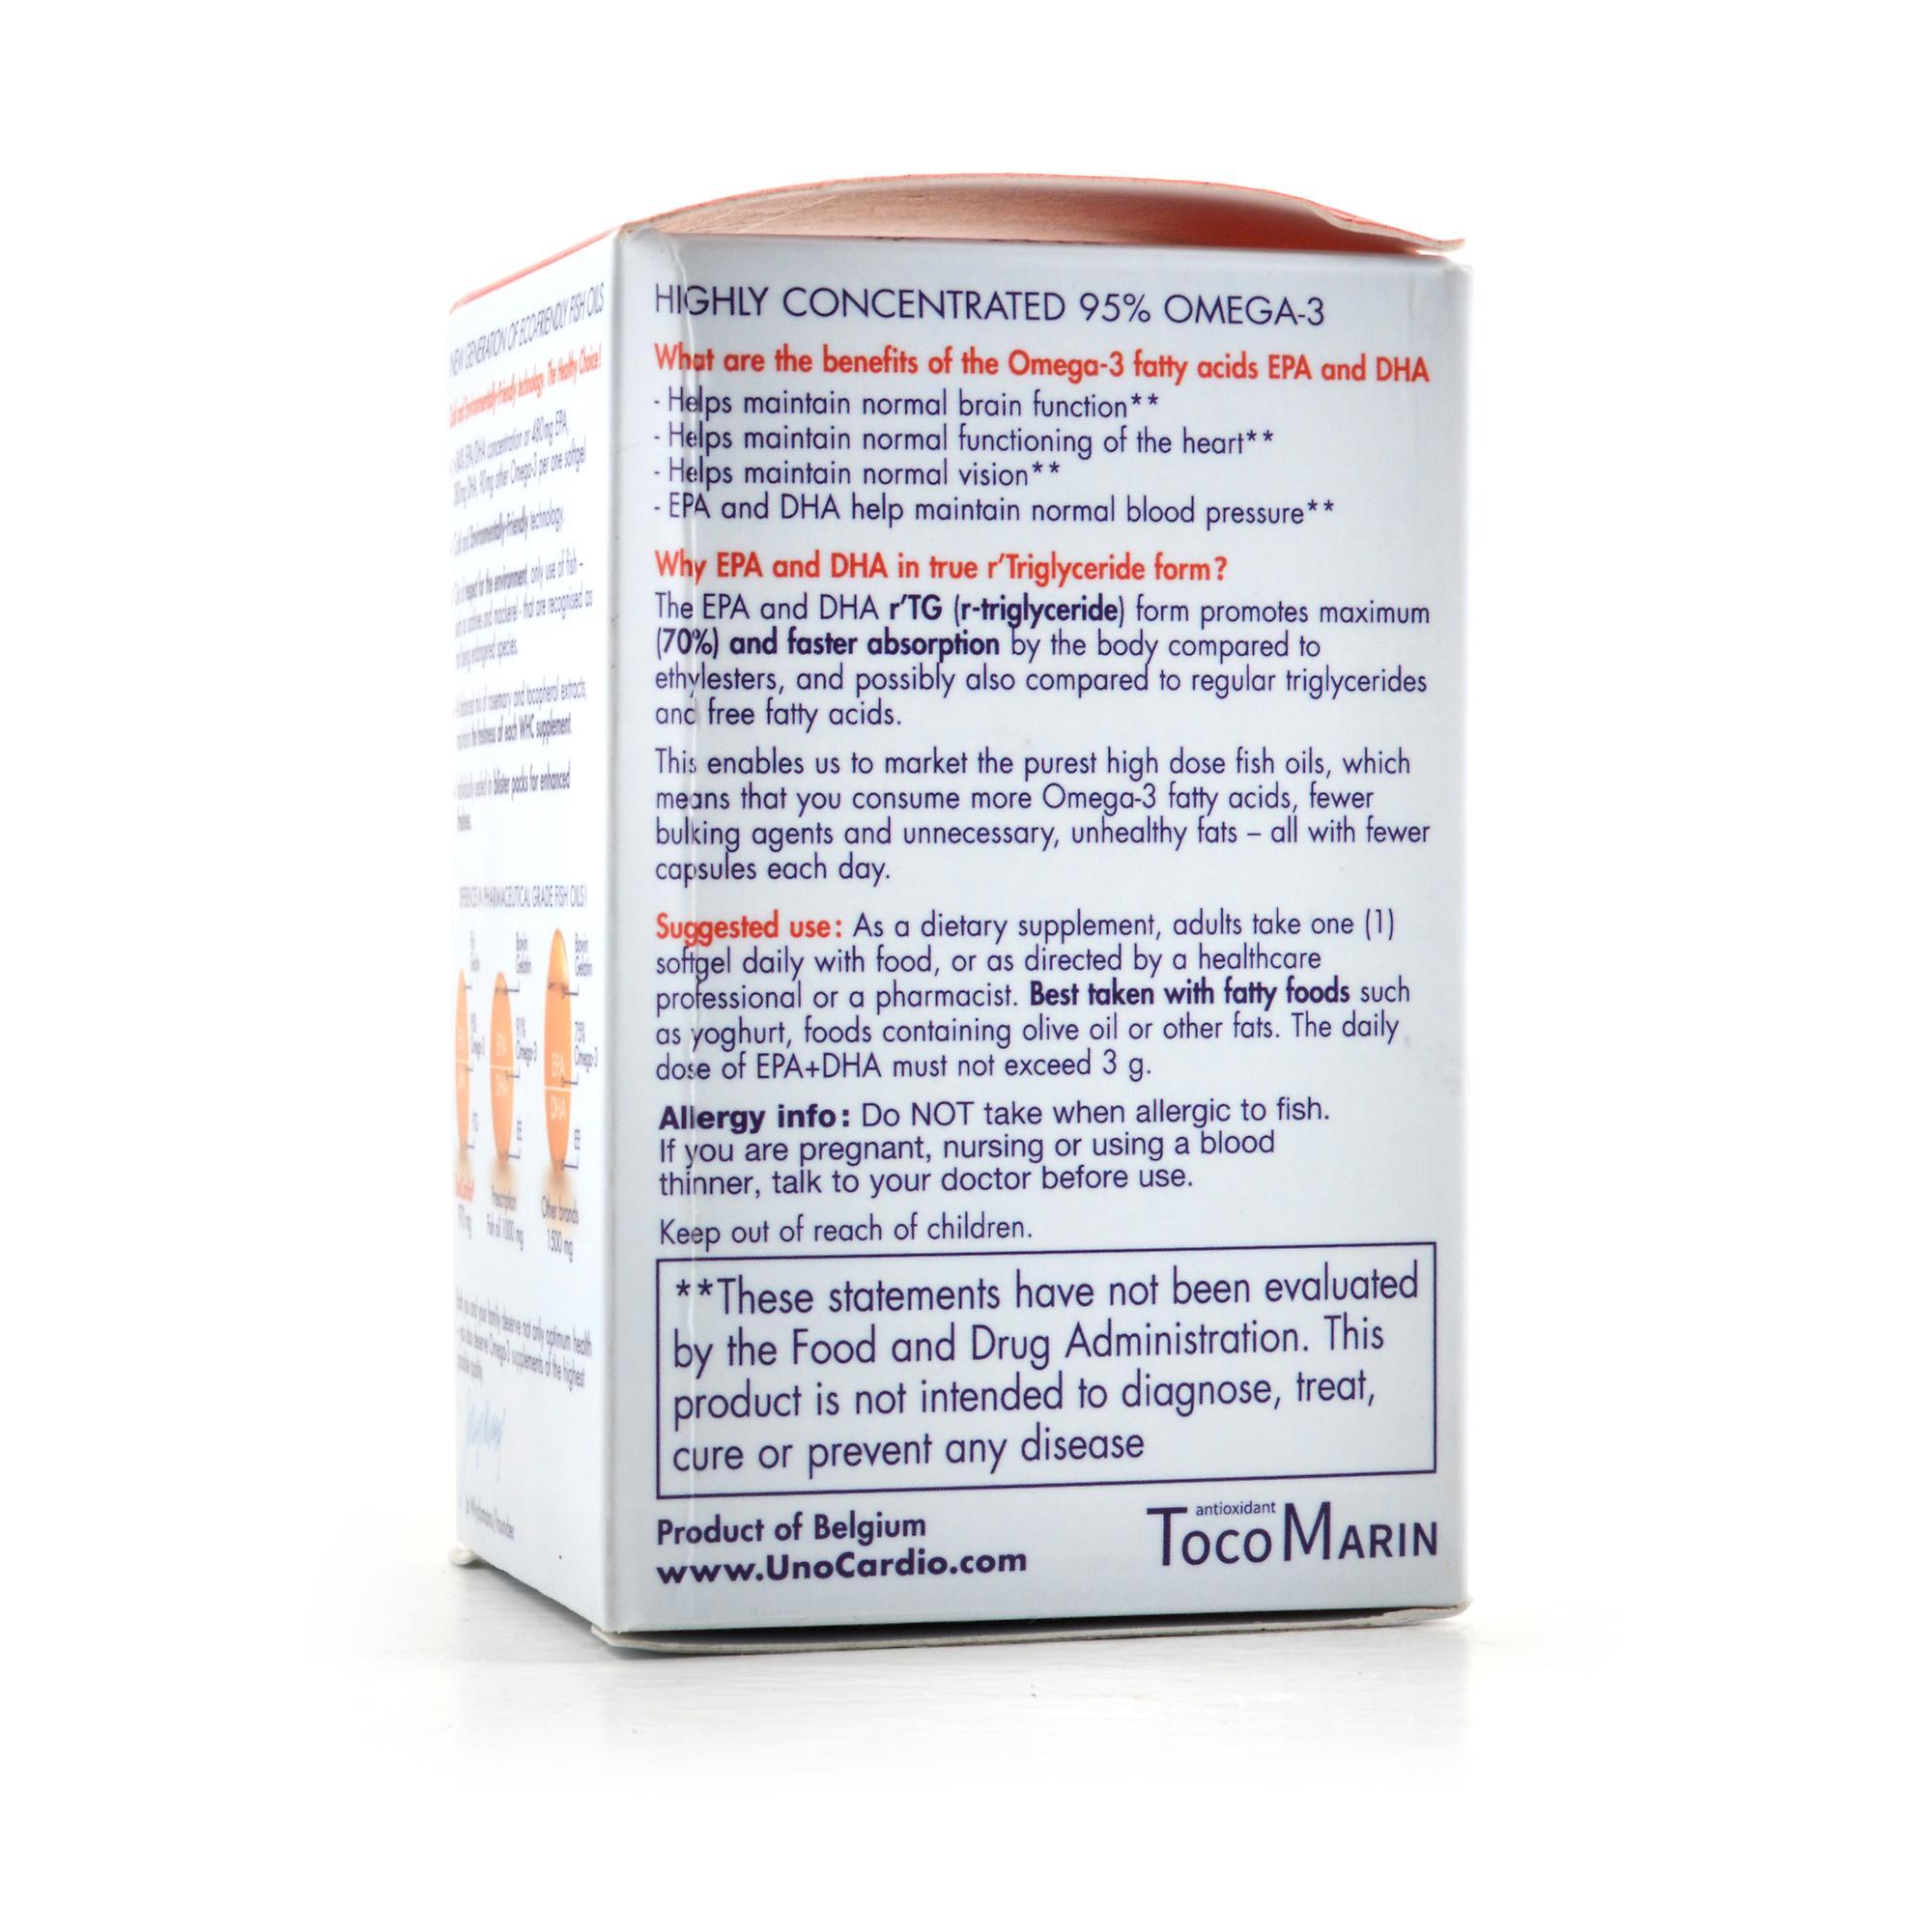 whc unocardio r 39 triglyceride omega 3 review labdoor